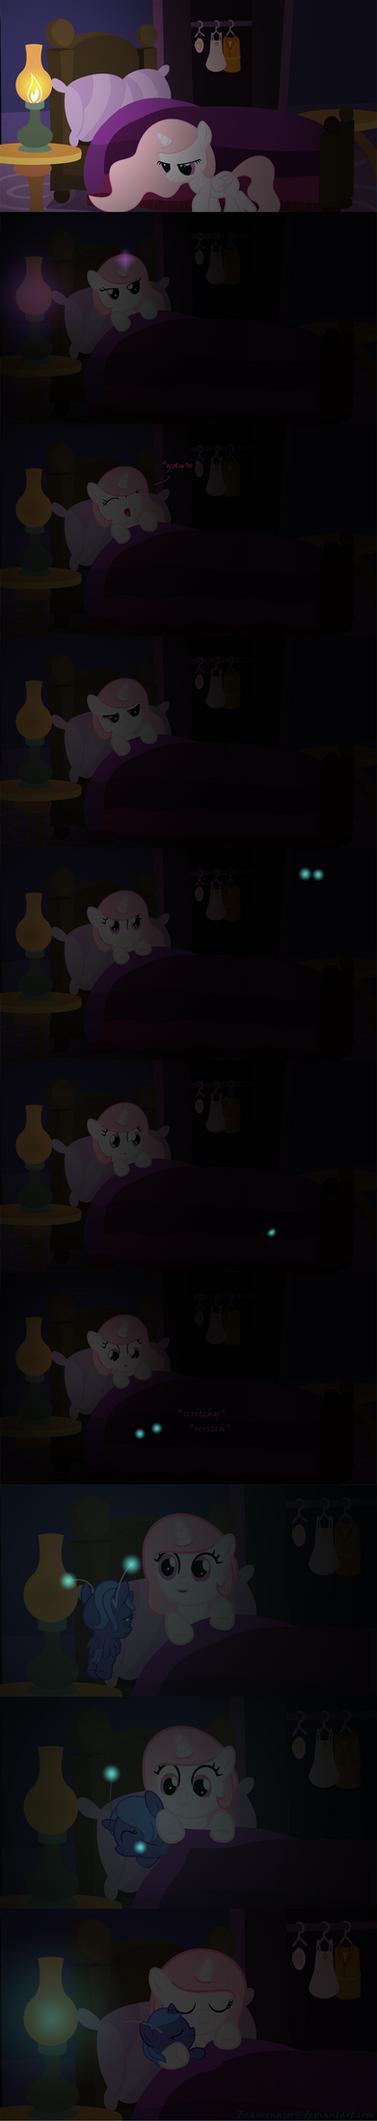 Lights Out by Beavernator